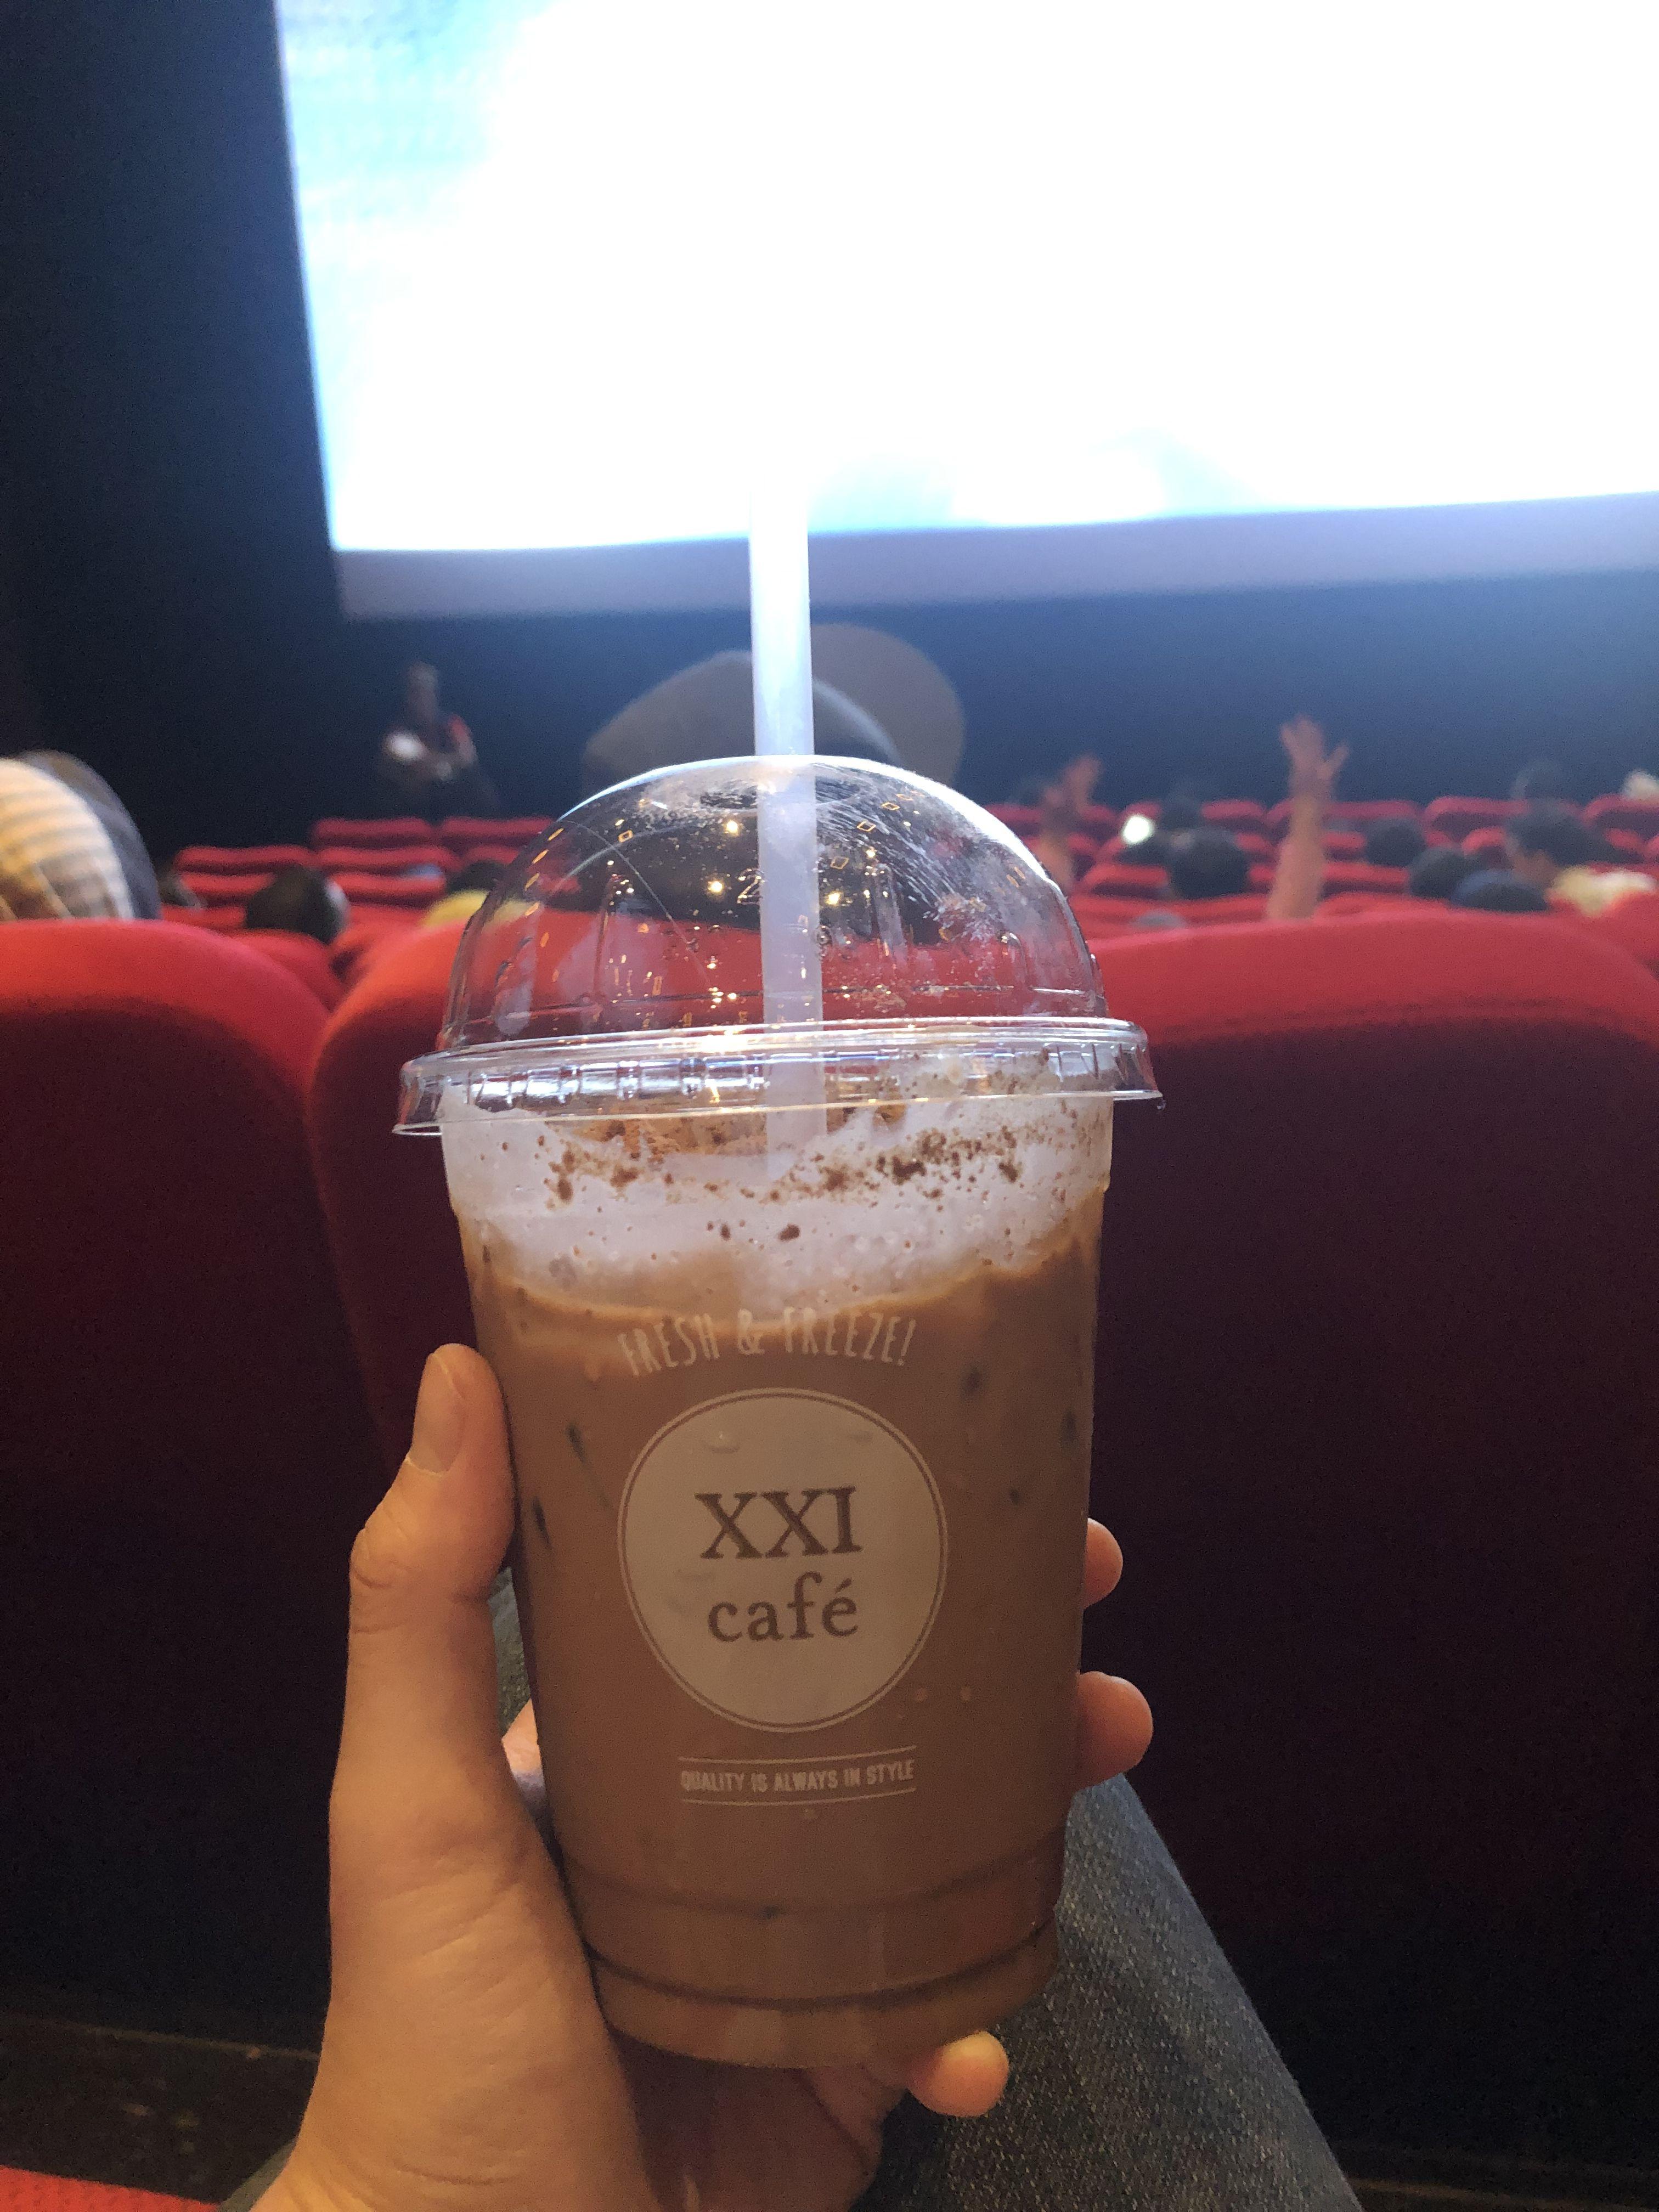 Main Choice At Xxi Cafe Milodinosaurs Cemilan Fotografi